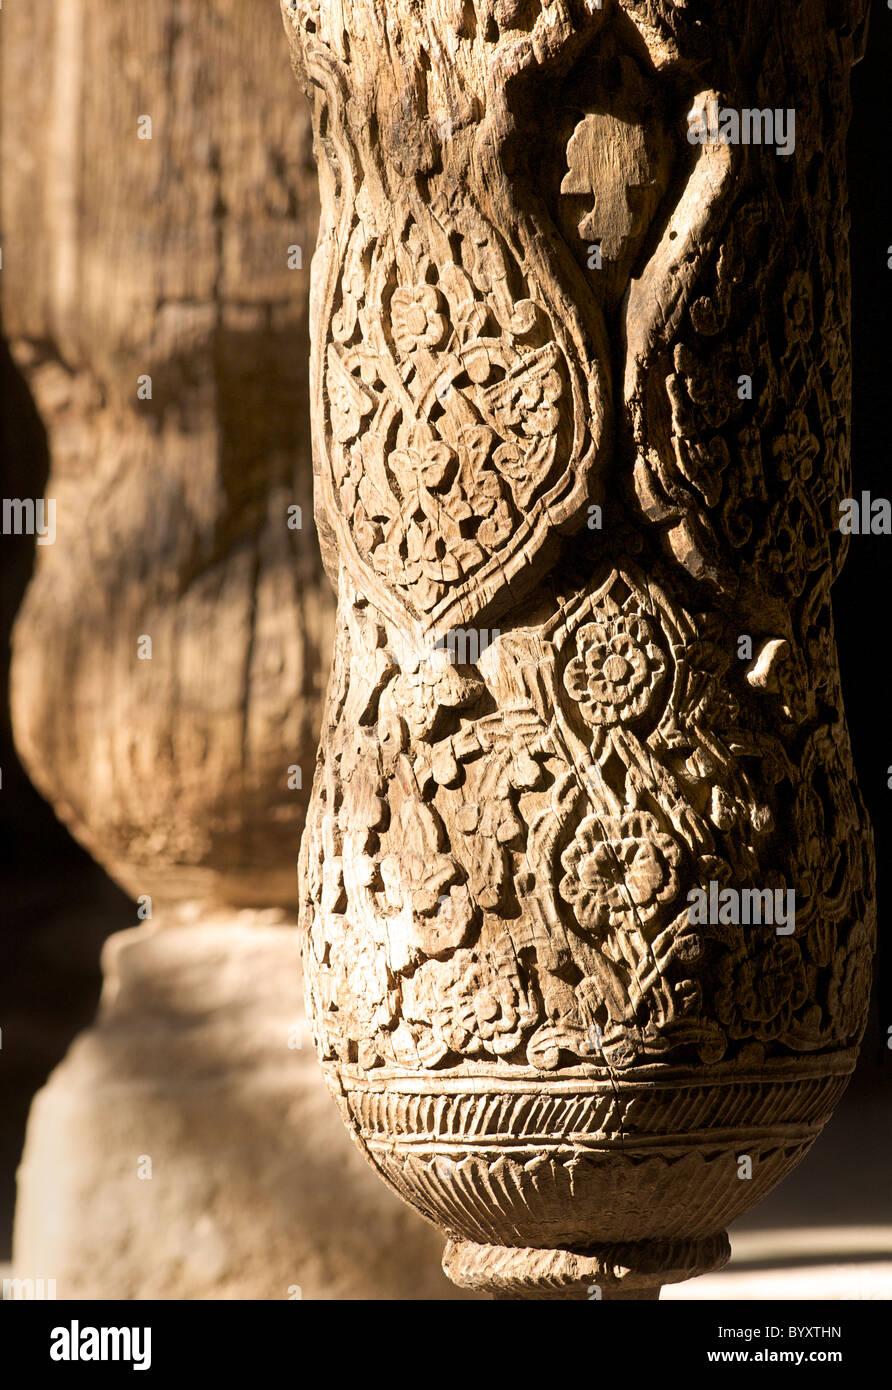 Carved wooden pillars inside the Juma Mosque, Khiva, Uzbekistan - Stock Image